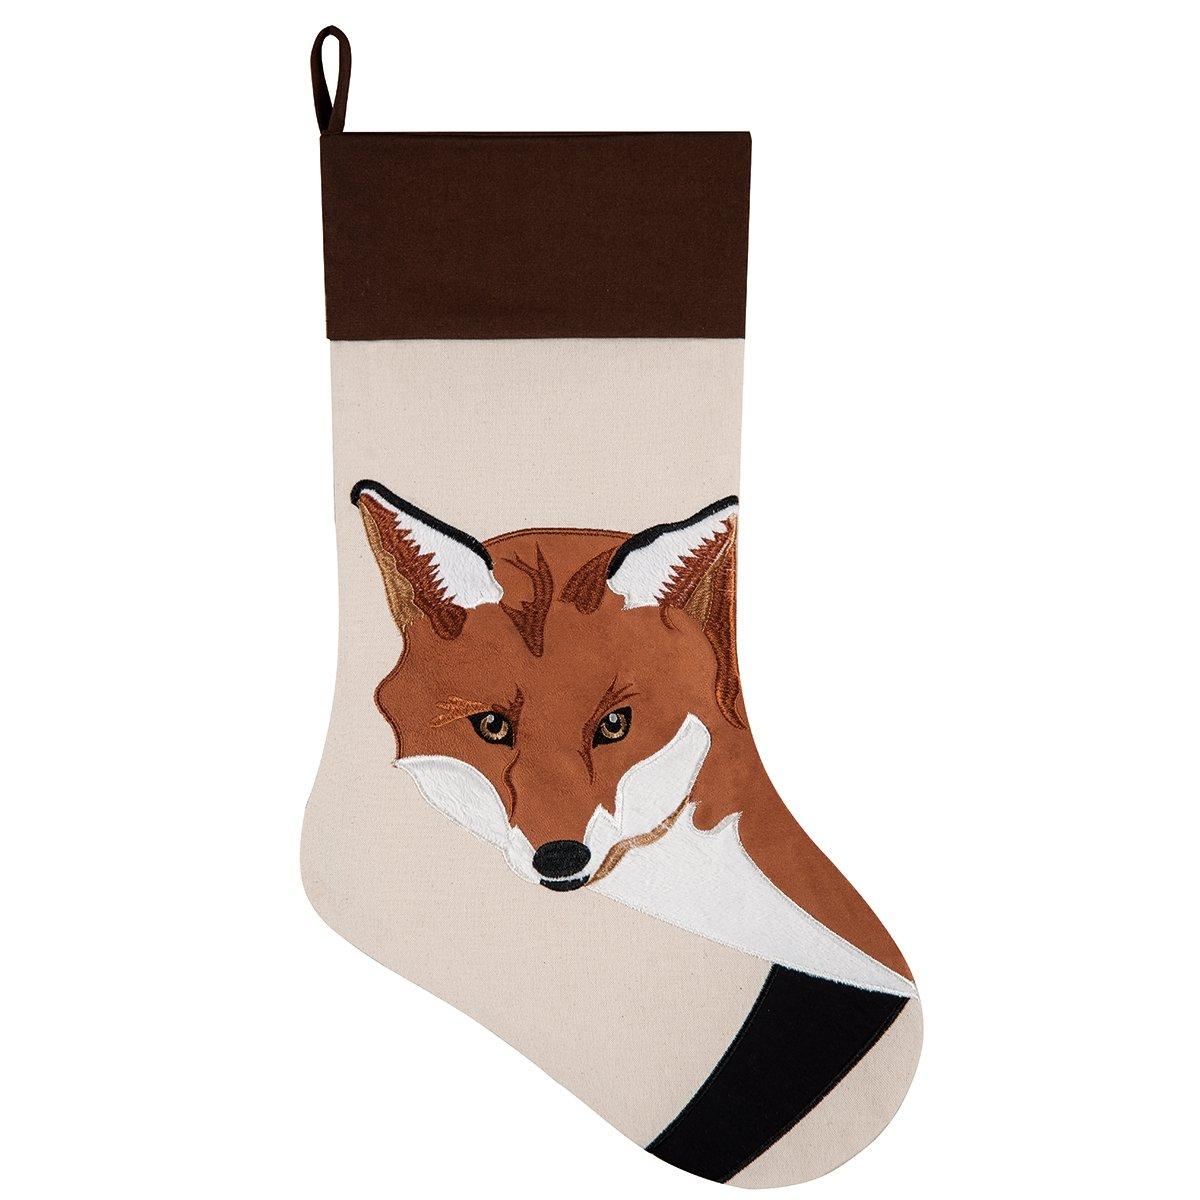 8.5x20'' Christmas Stocking, Fox